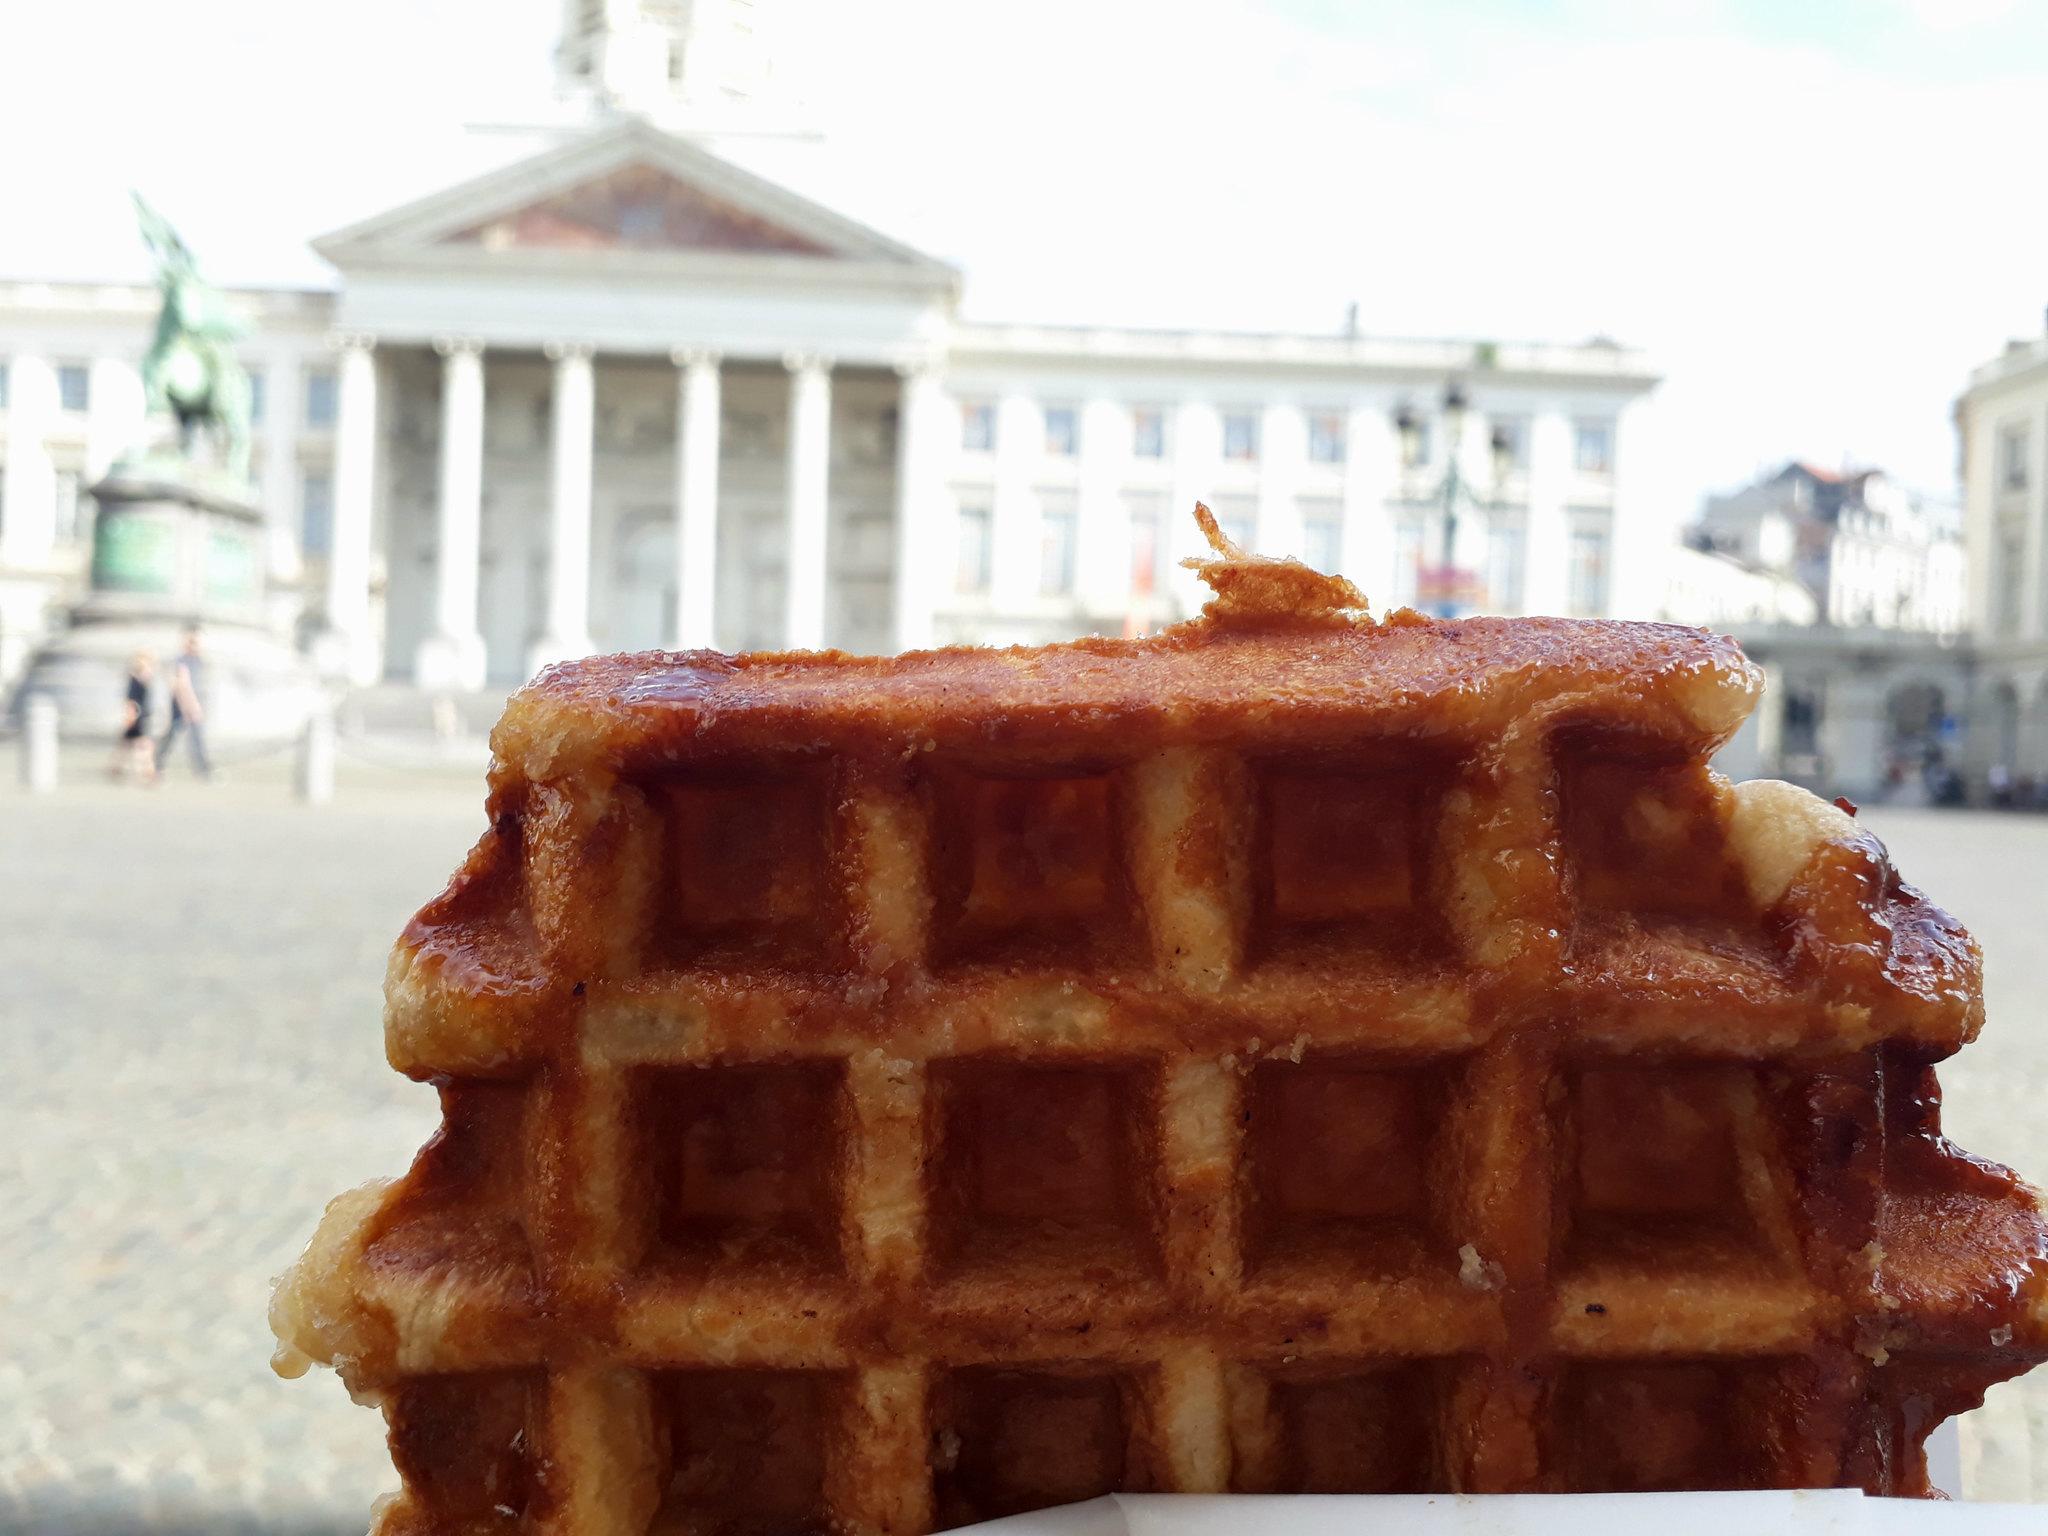 belgica-waffle2